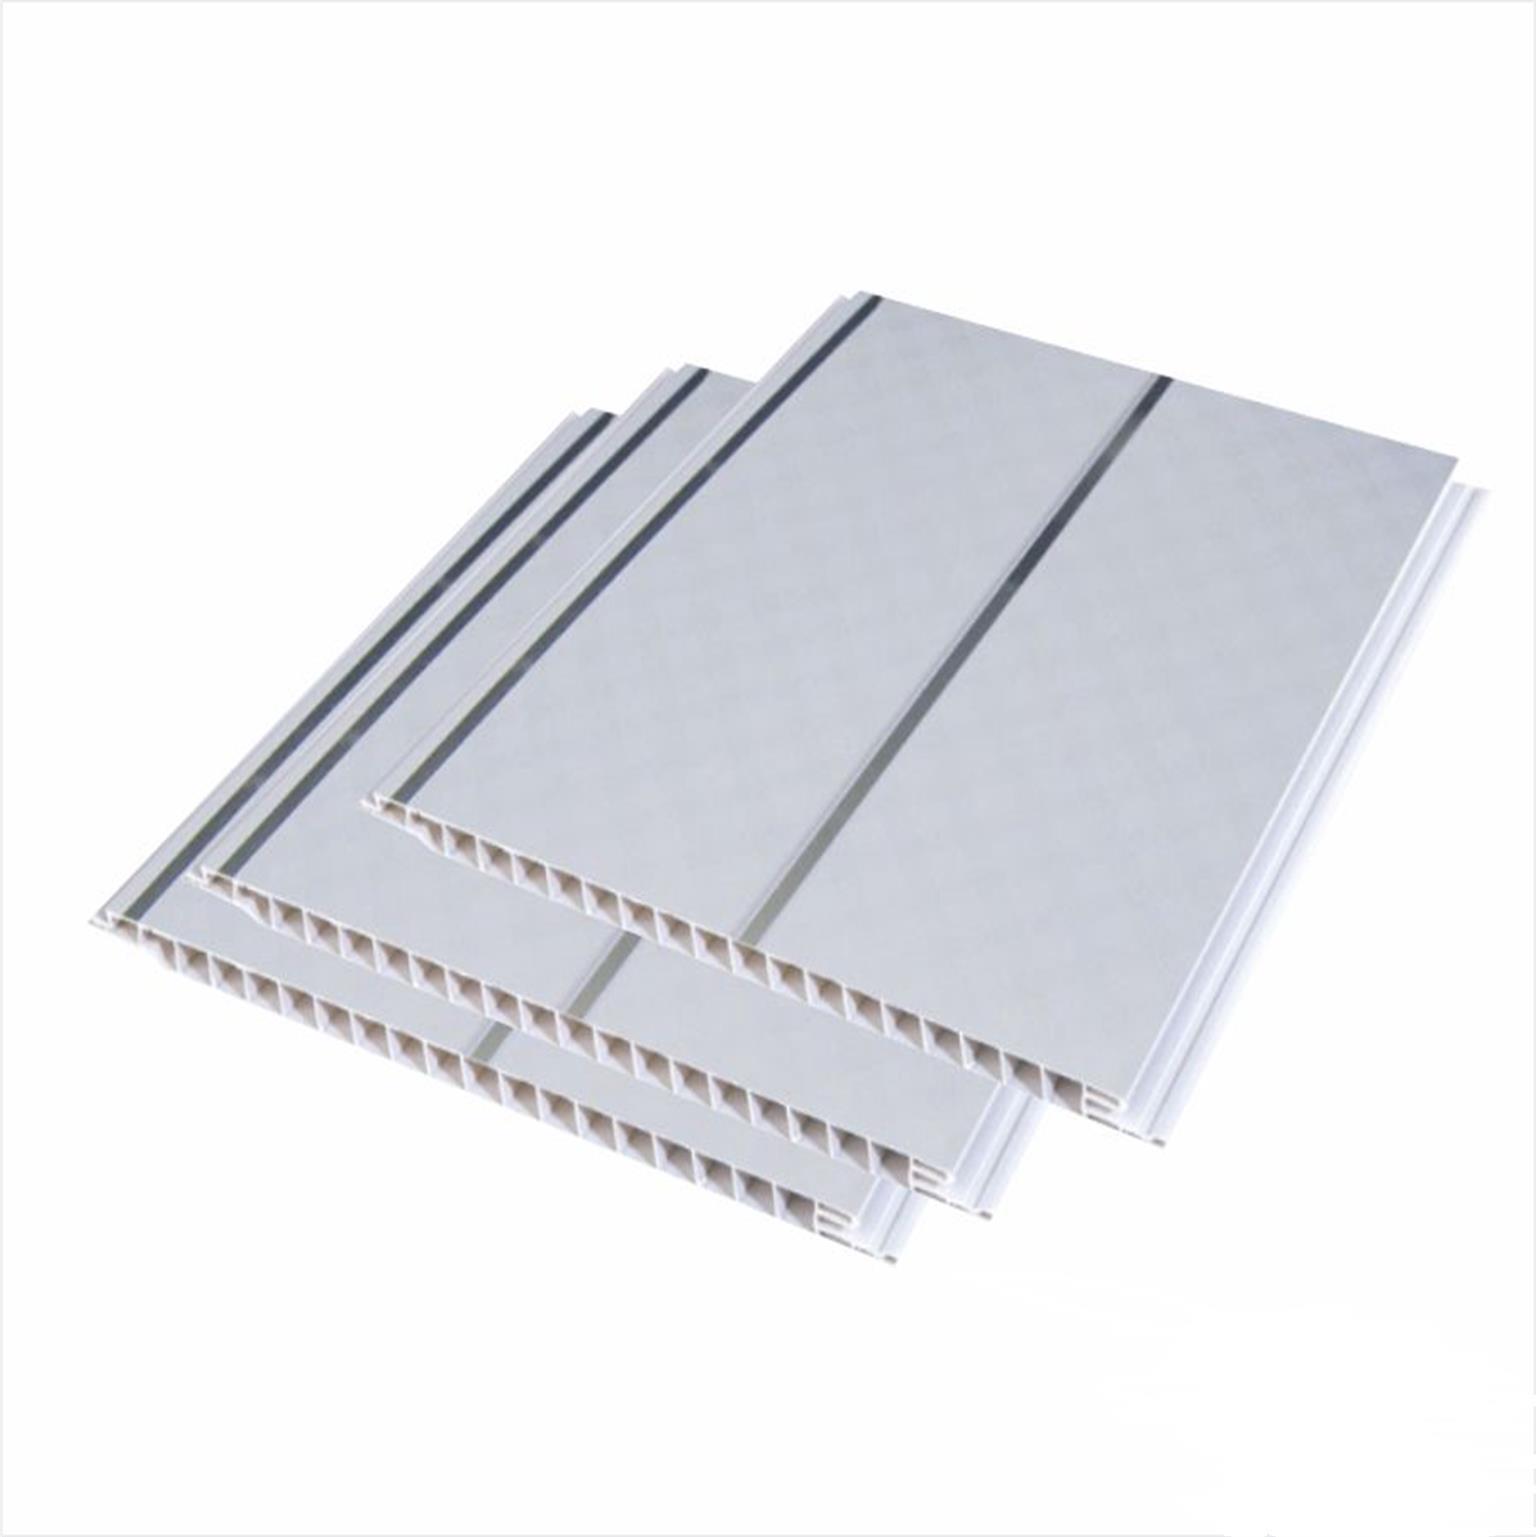 PVC Ceiling  Panels 3.9m